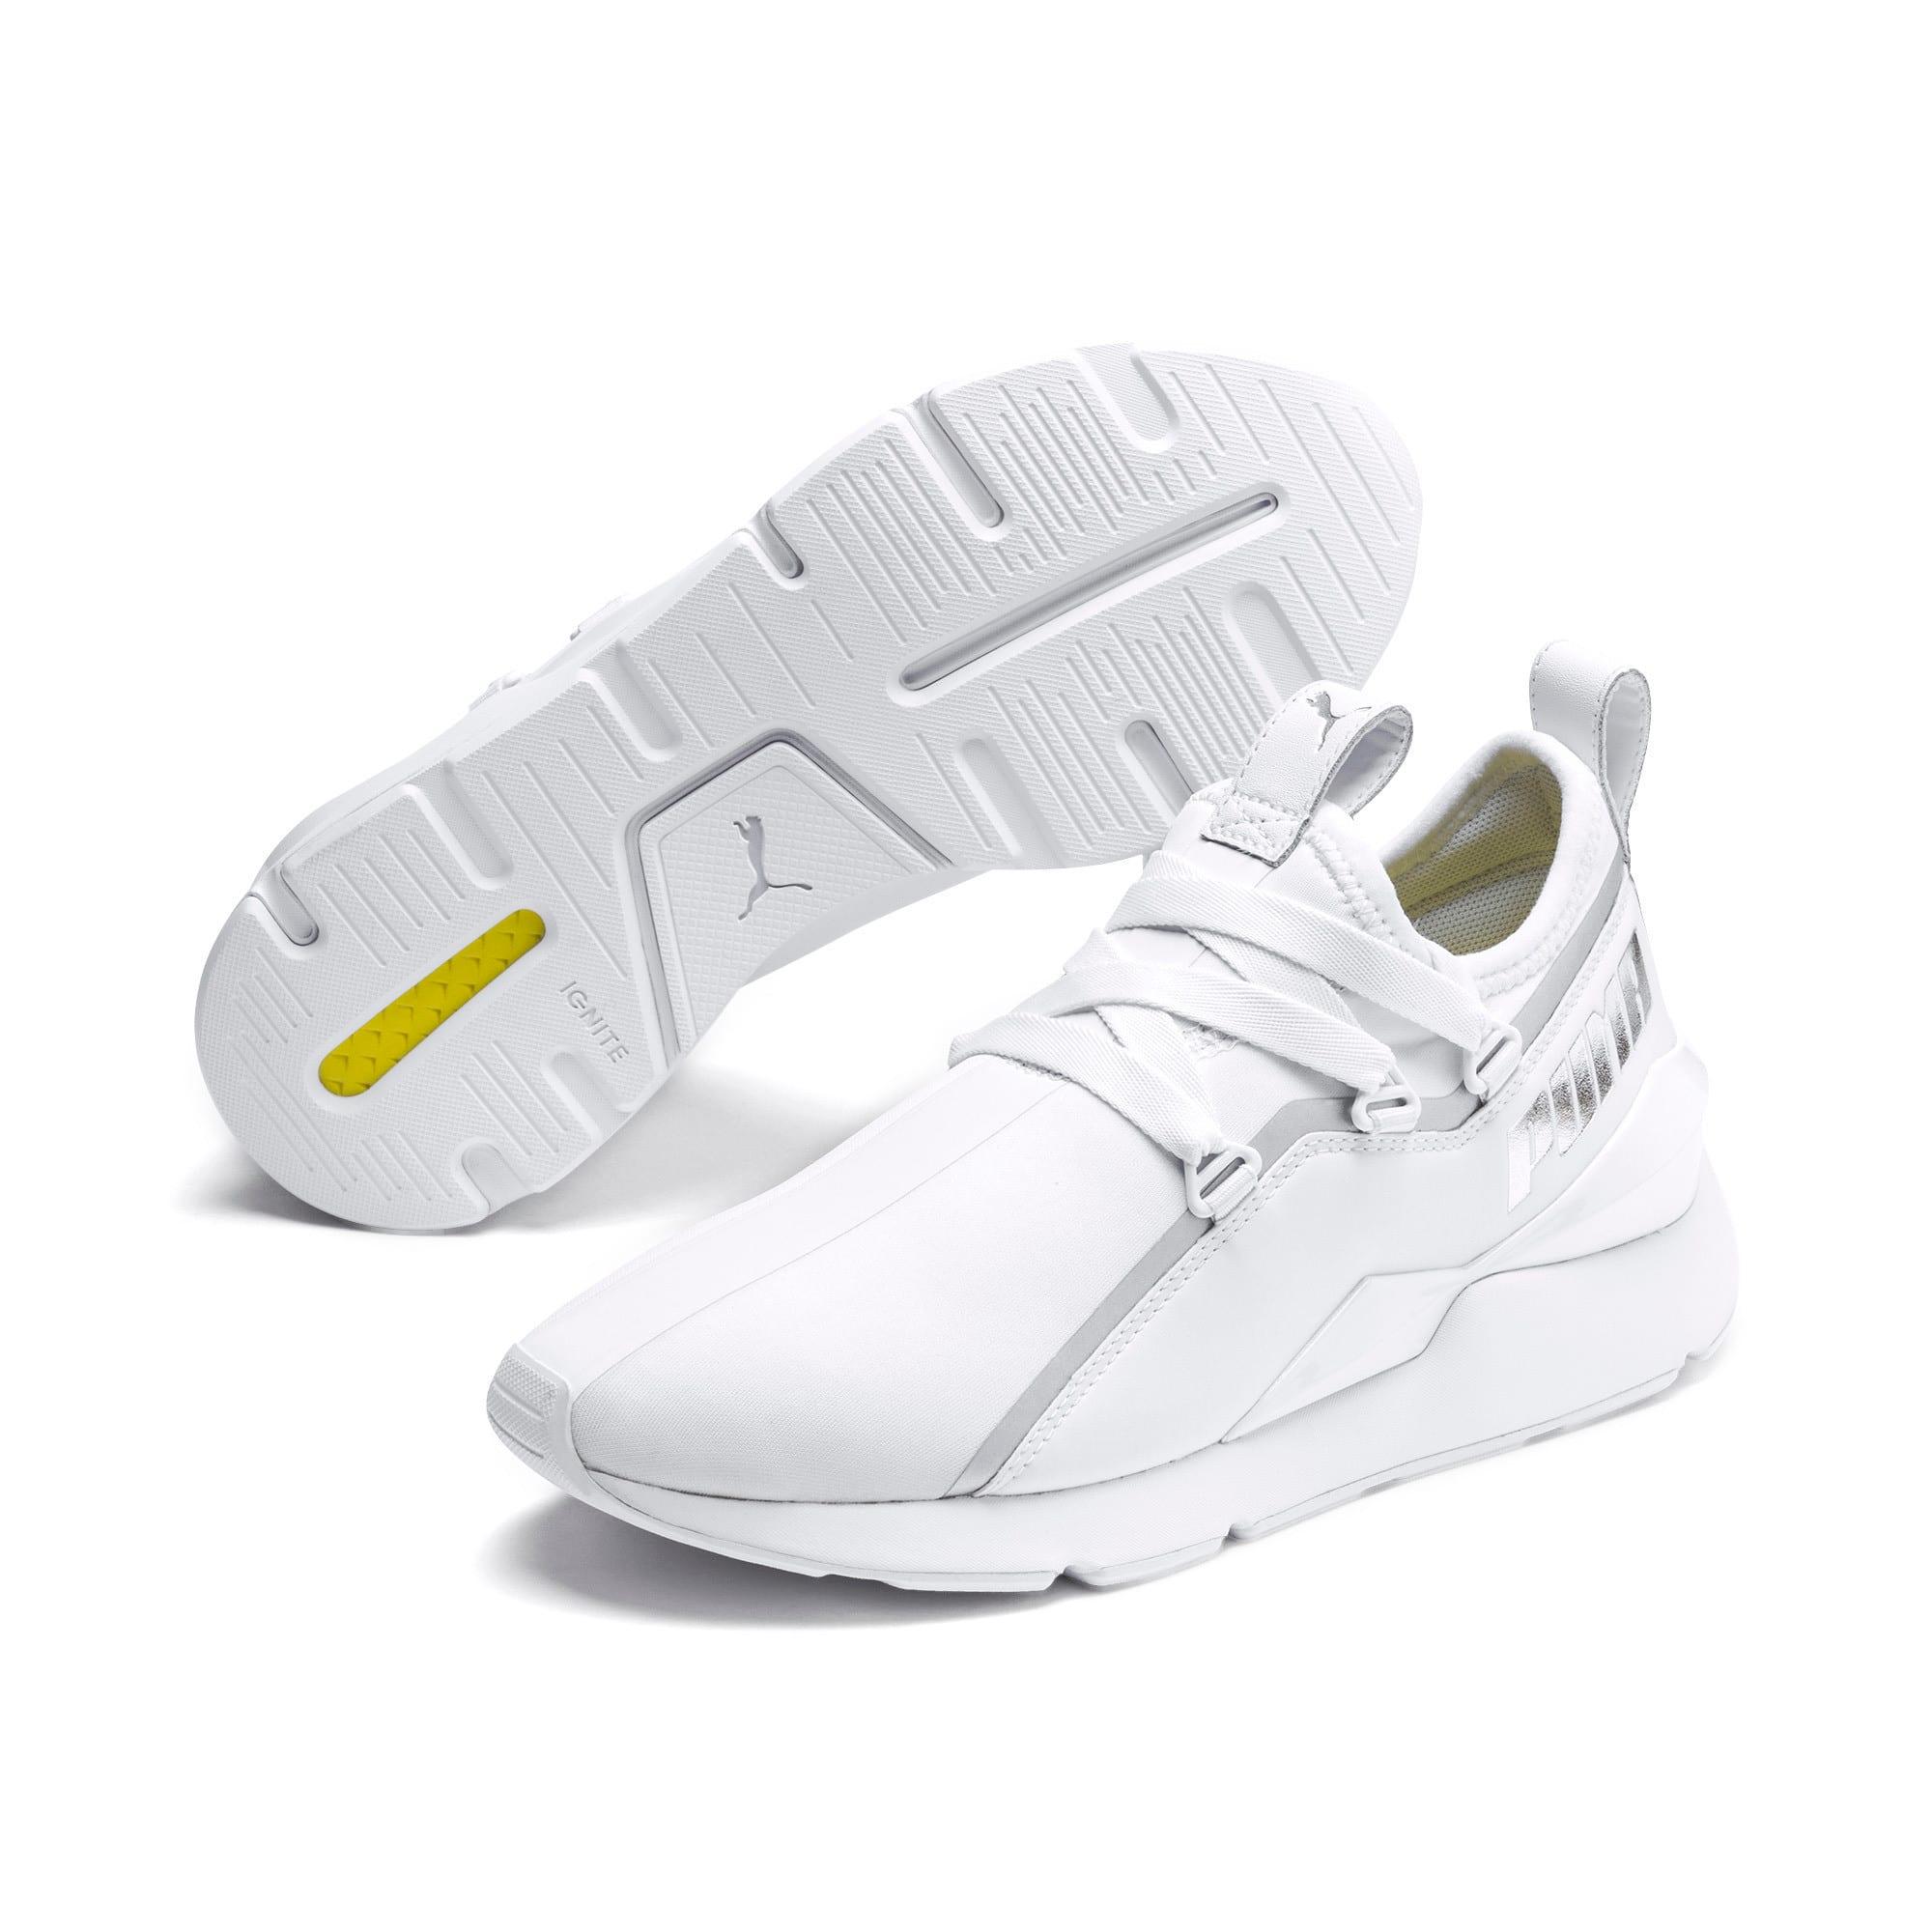 Thumbnail 3 of Muse 2 Trailblazer Women's Sneakers, Puma White-Puma Silver, medium